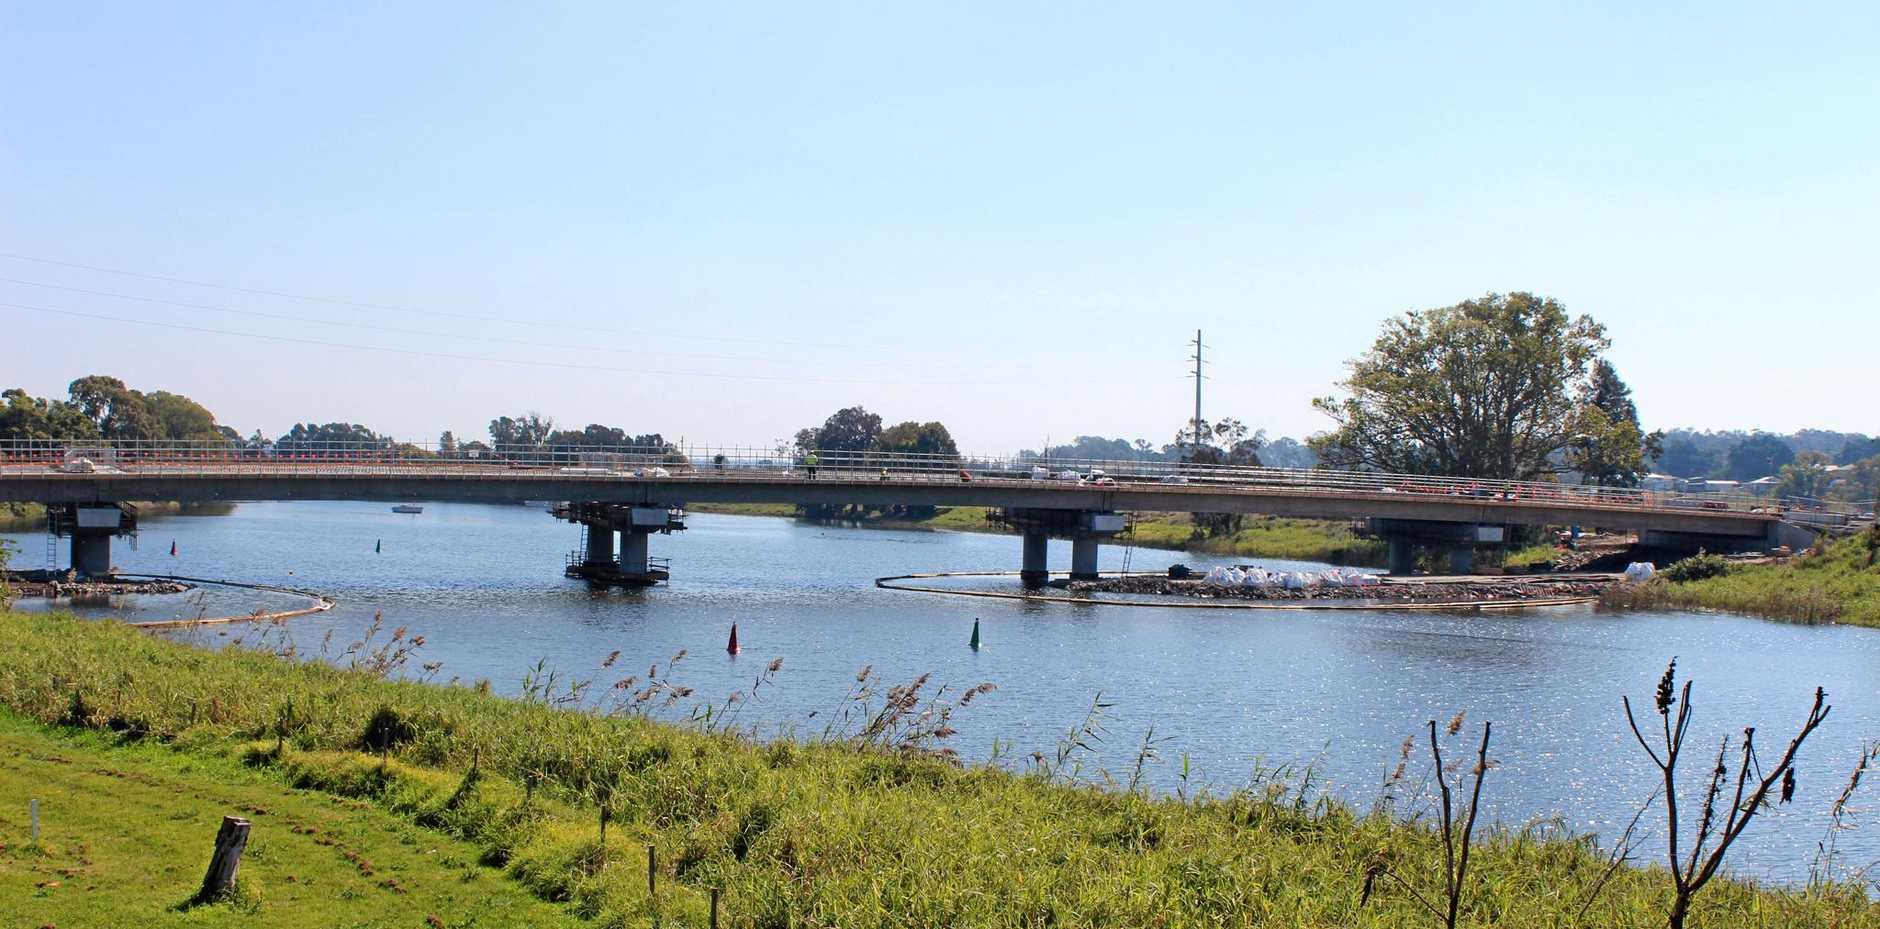 BRIDGING THE GAP: The new Sportsman Creek bridge is progressing well.